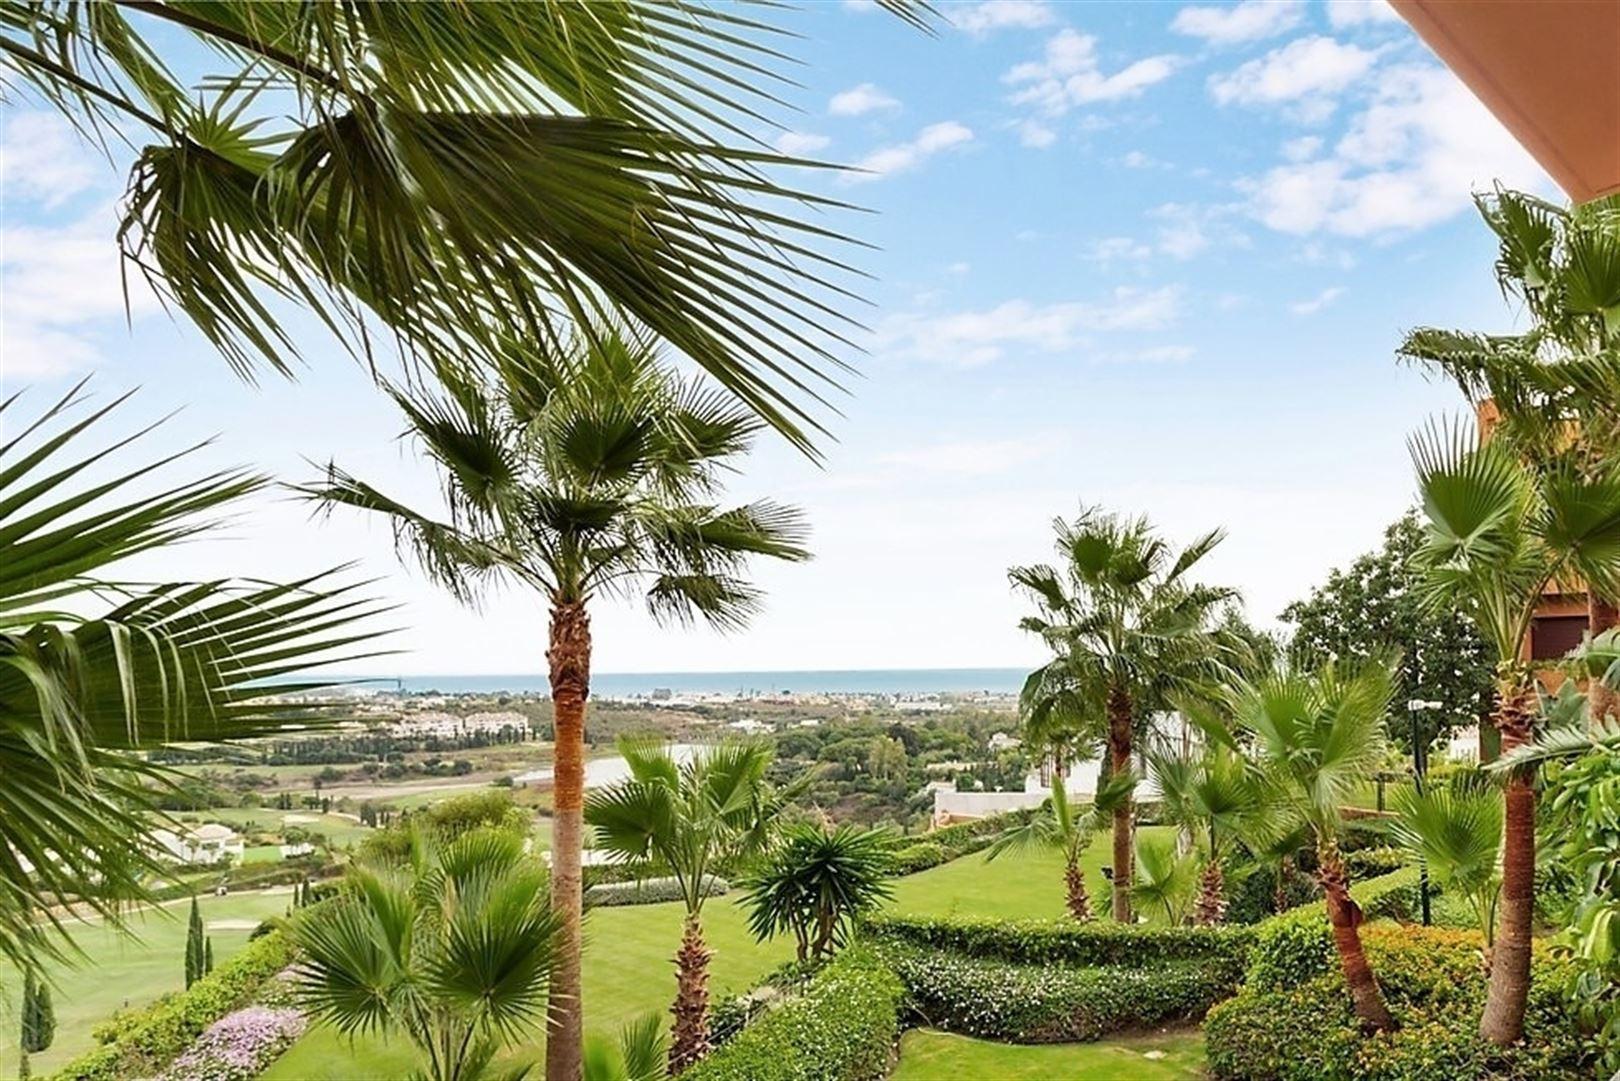 Foto 2 : Appartement te 29679 MARBELLA (Spanje) - Prijs € 1.750